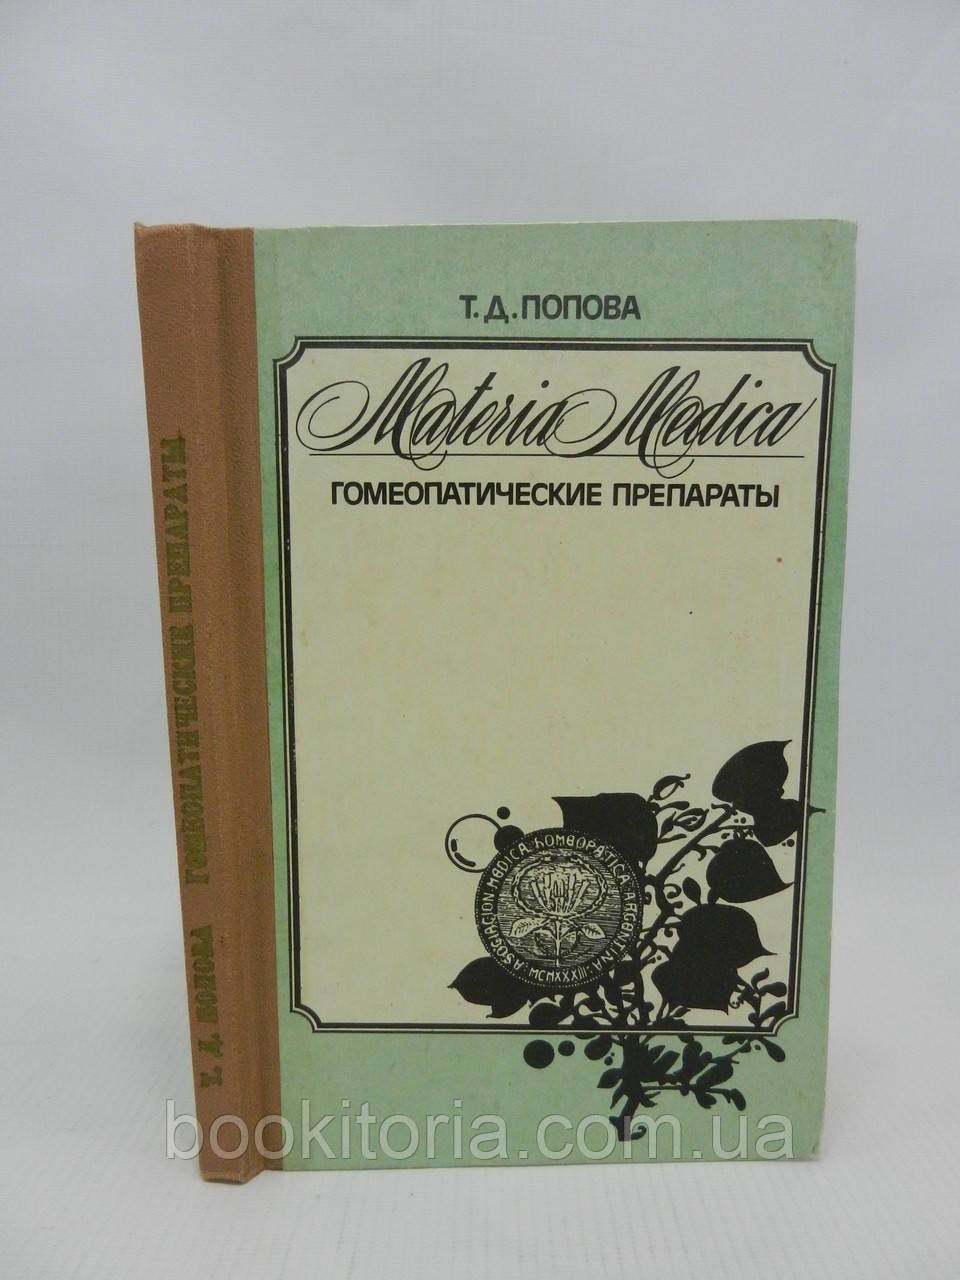 Попова Т. Materia Medica. Гомеопатические лекарства. Справочник (б/у).